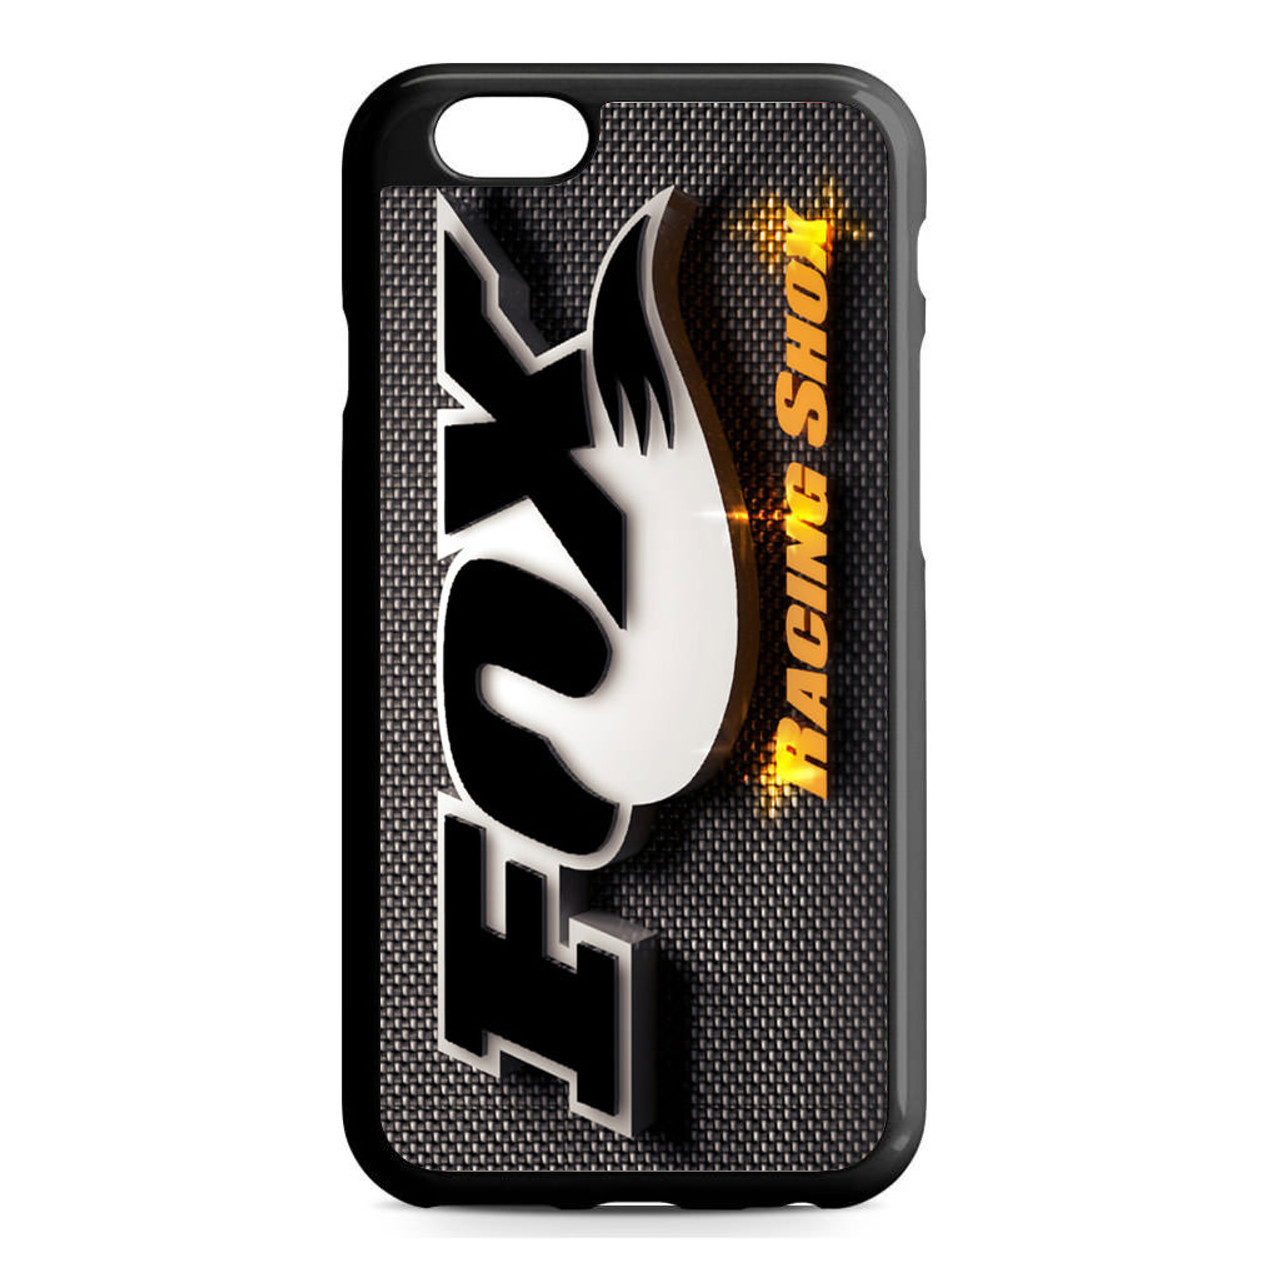 promo code 87947 ea84b Fox Racing Shox iPhone 6/6S Case